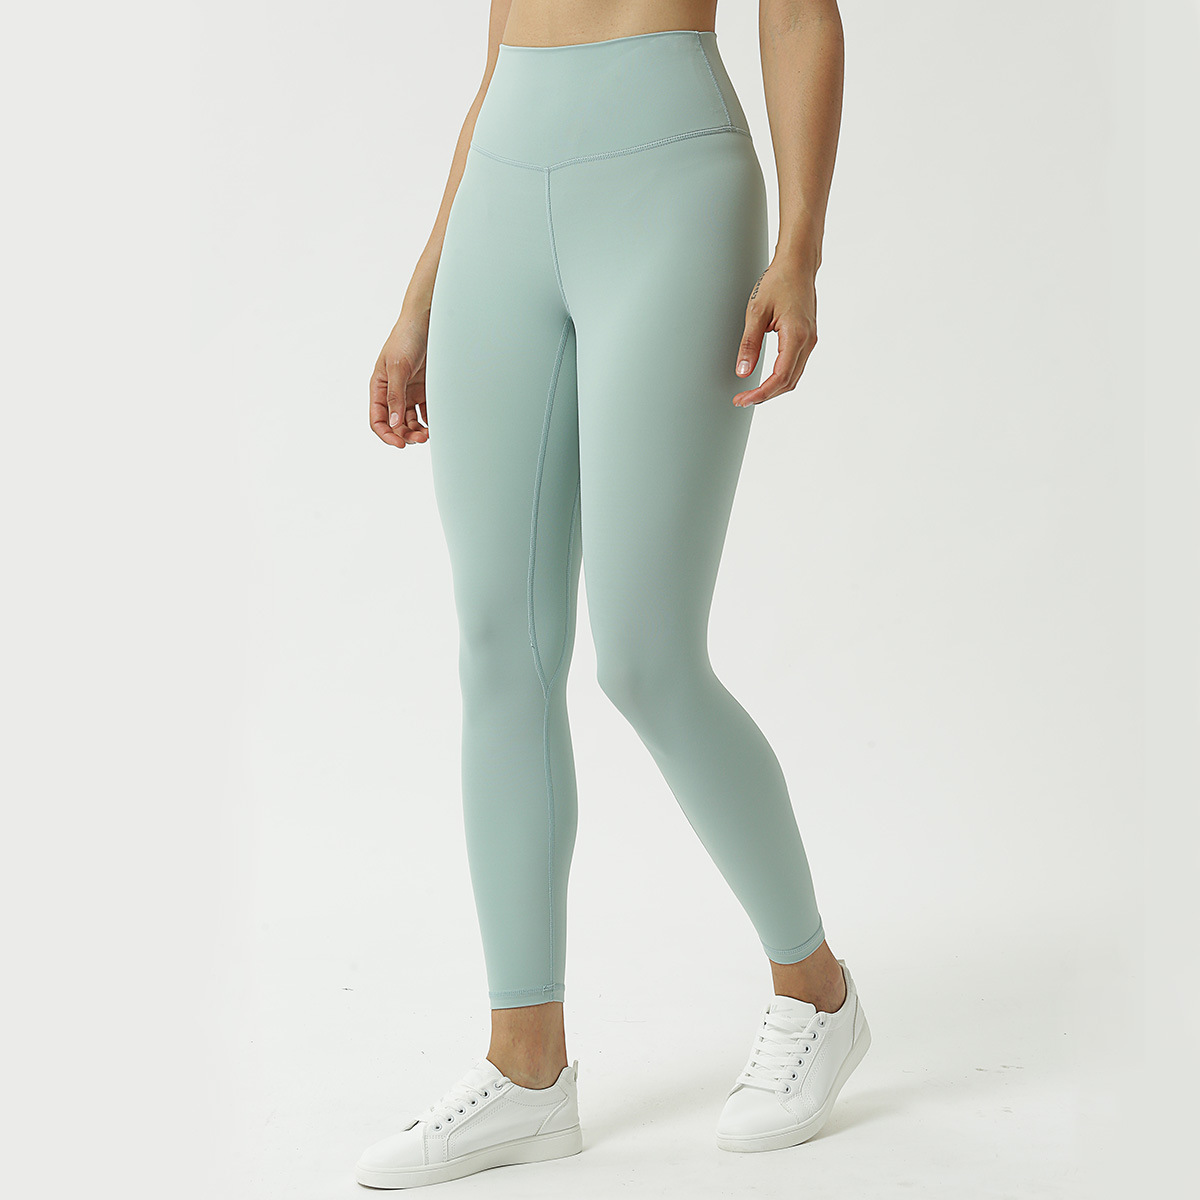 New Womens High Waist Leggings Women Booty-Lifting Tights Yoga Pants Gym Pants Training Running Ladies calzas deportivas mujer